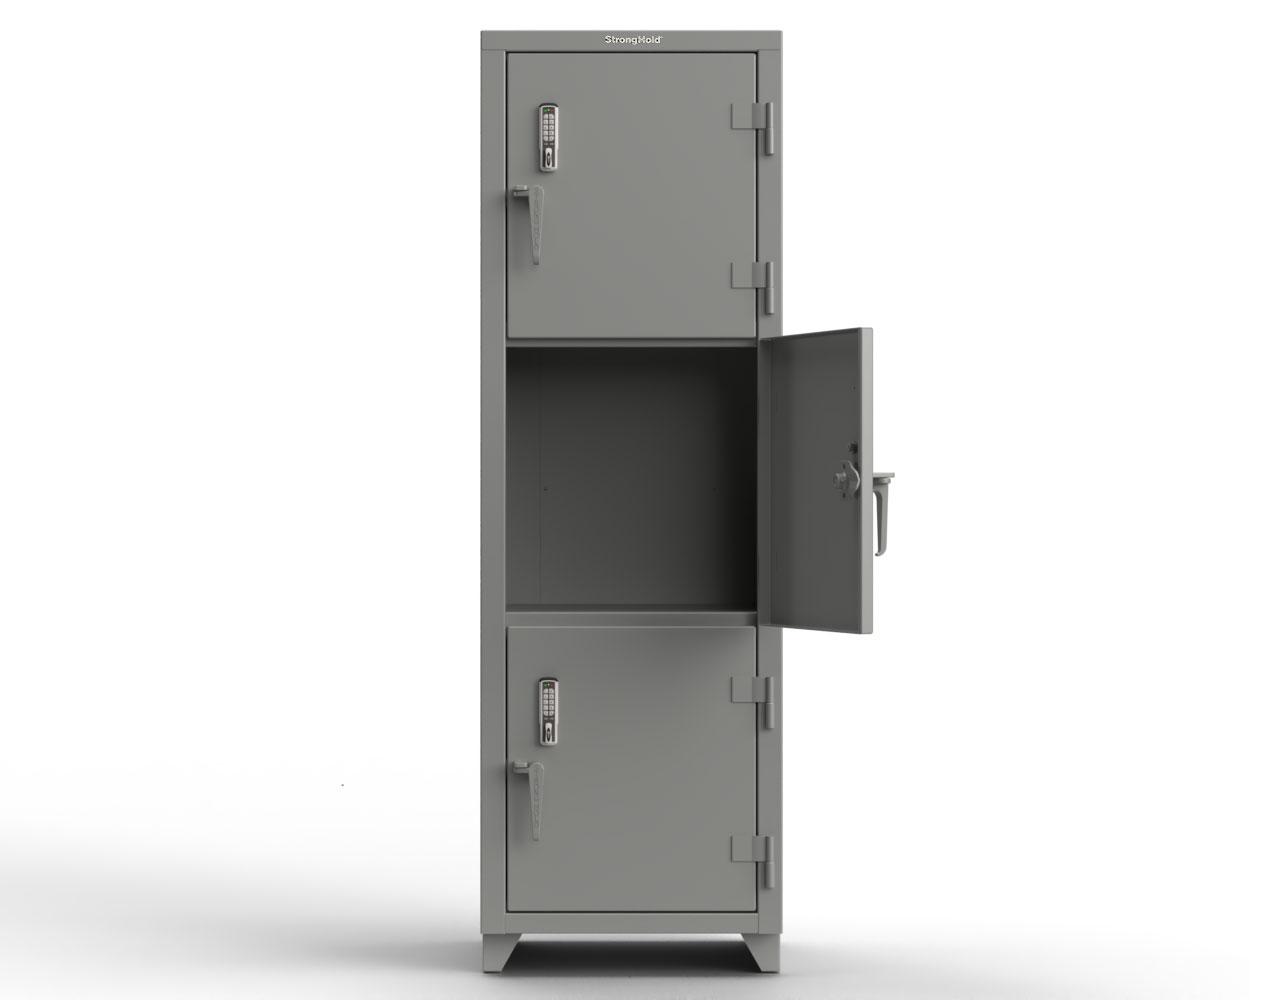 Extra Heavy Duty 14 GA Triple-Tier Locker with Keyless Entry Lock, 3 Compartments – 24 in. W x 24 in. D x 75 in. H